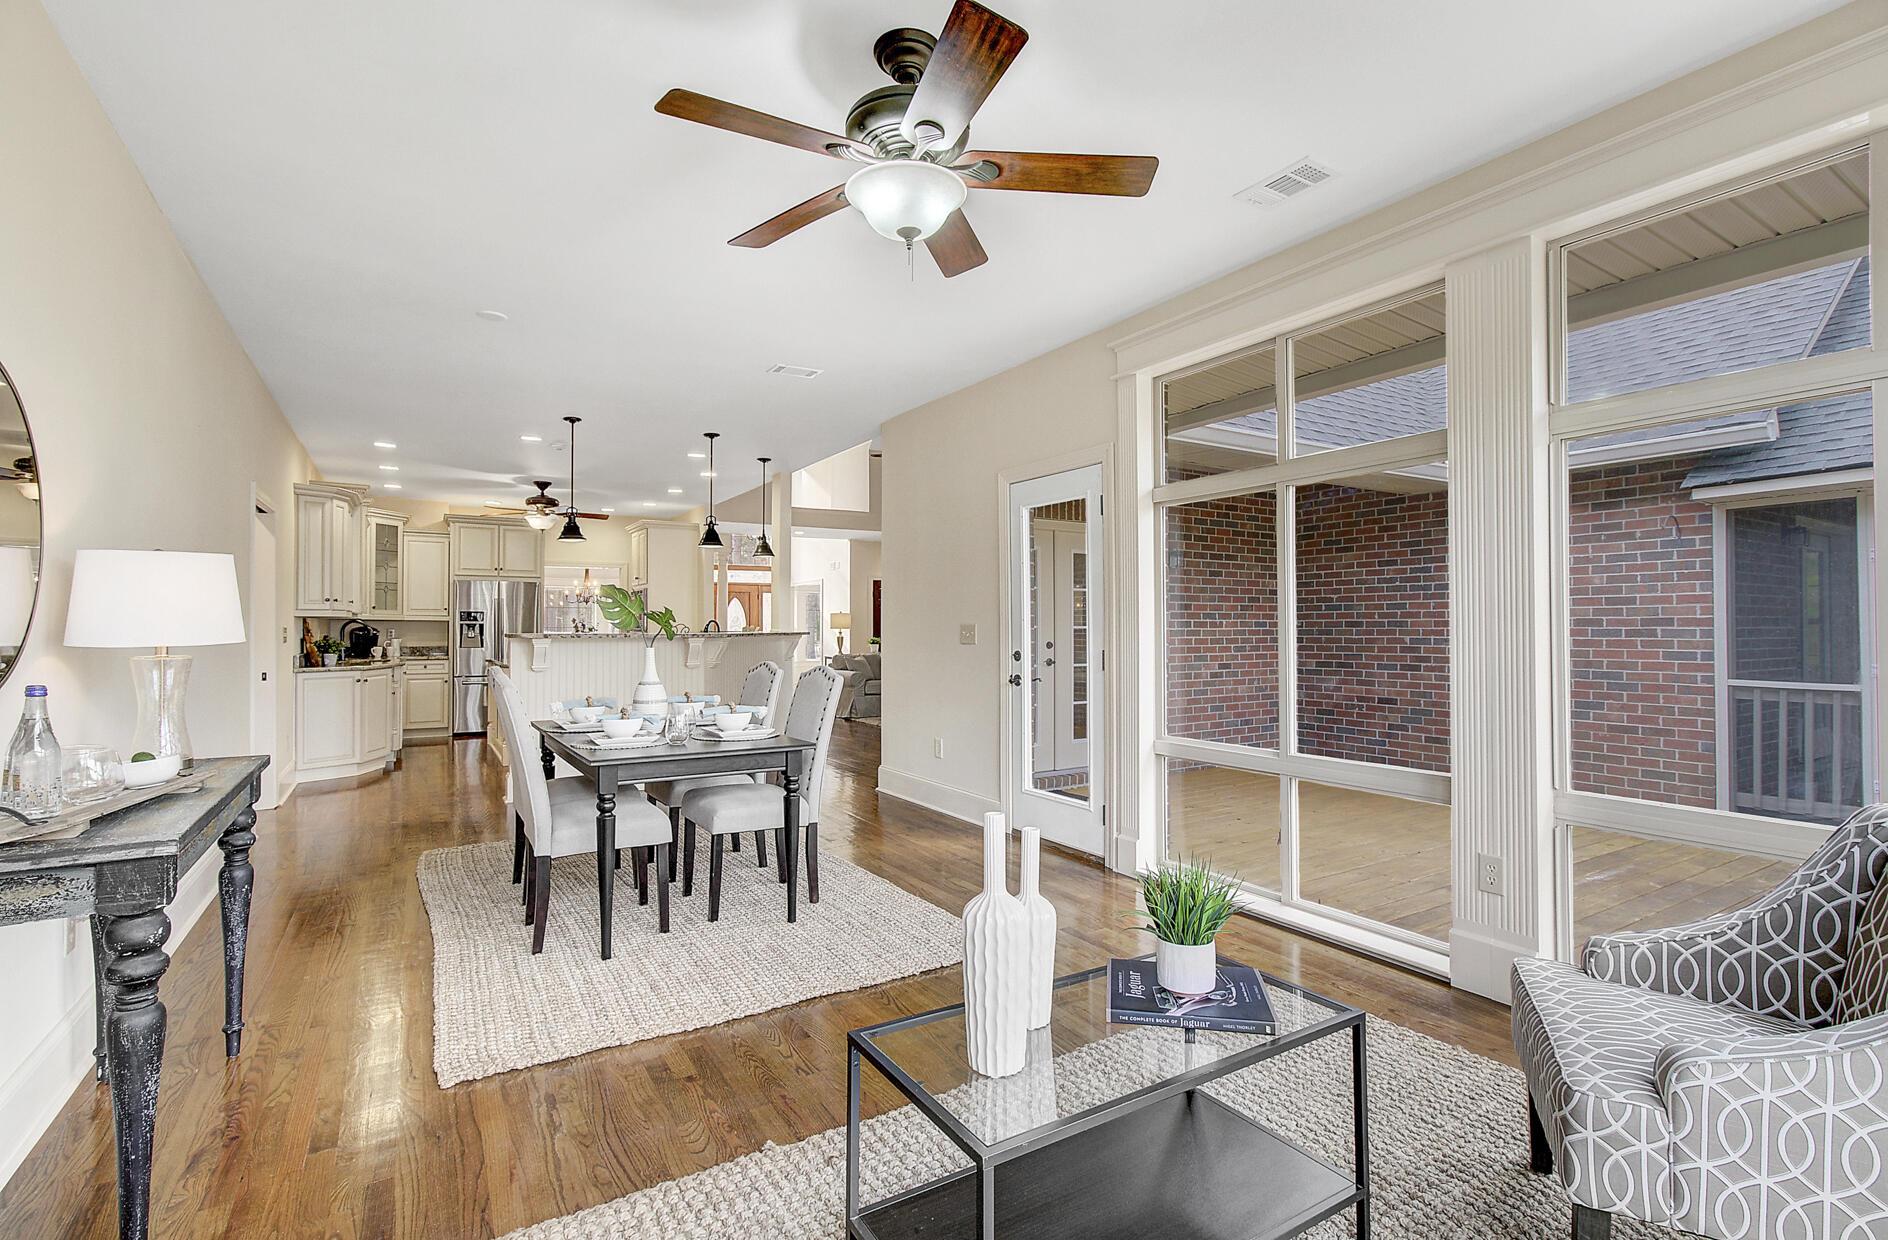 Dunes West Homes For Sale - 4123 Colonel Vanderhorst, Mount Pleasant, SC - 14